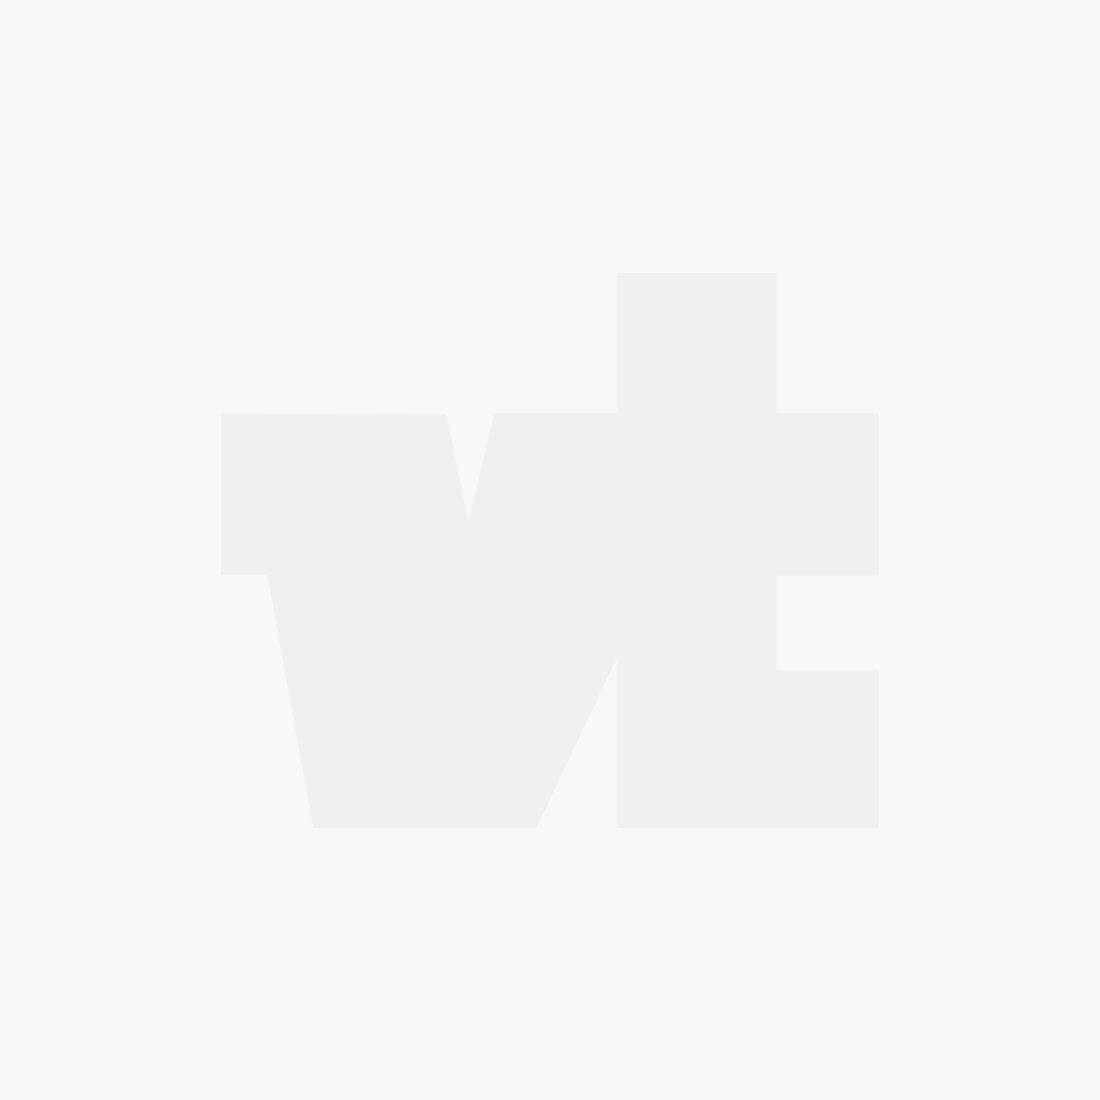 Edie tailored wide leg drapey pants